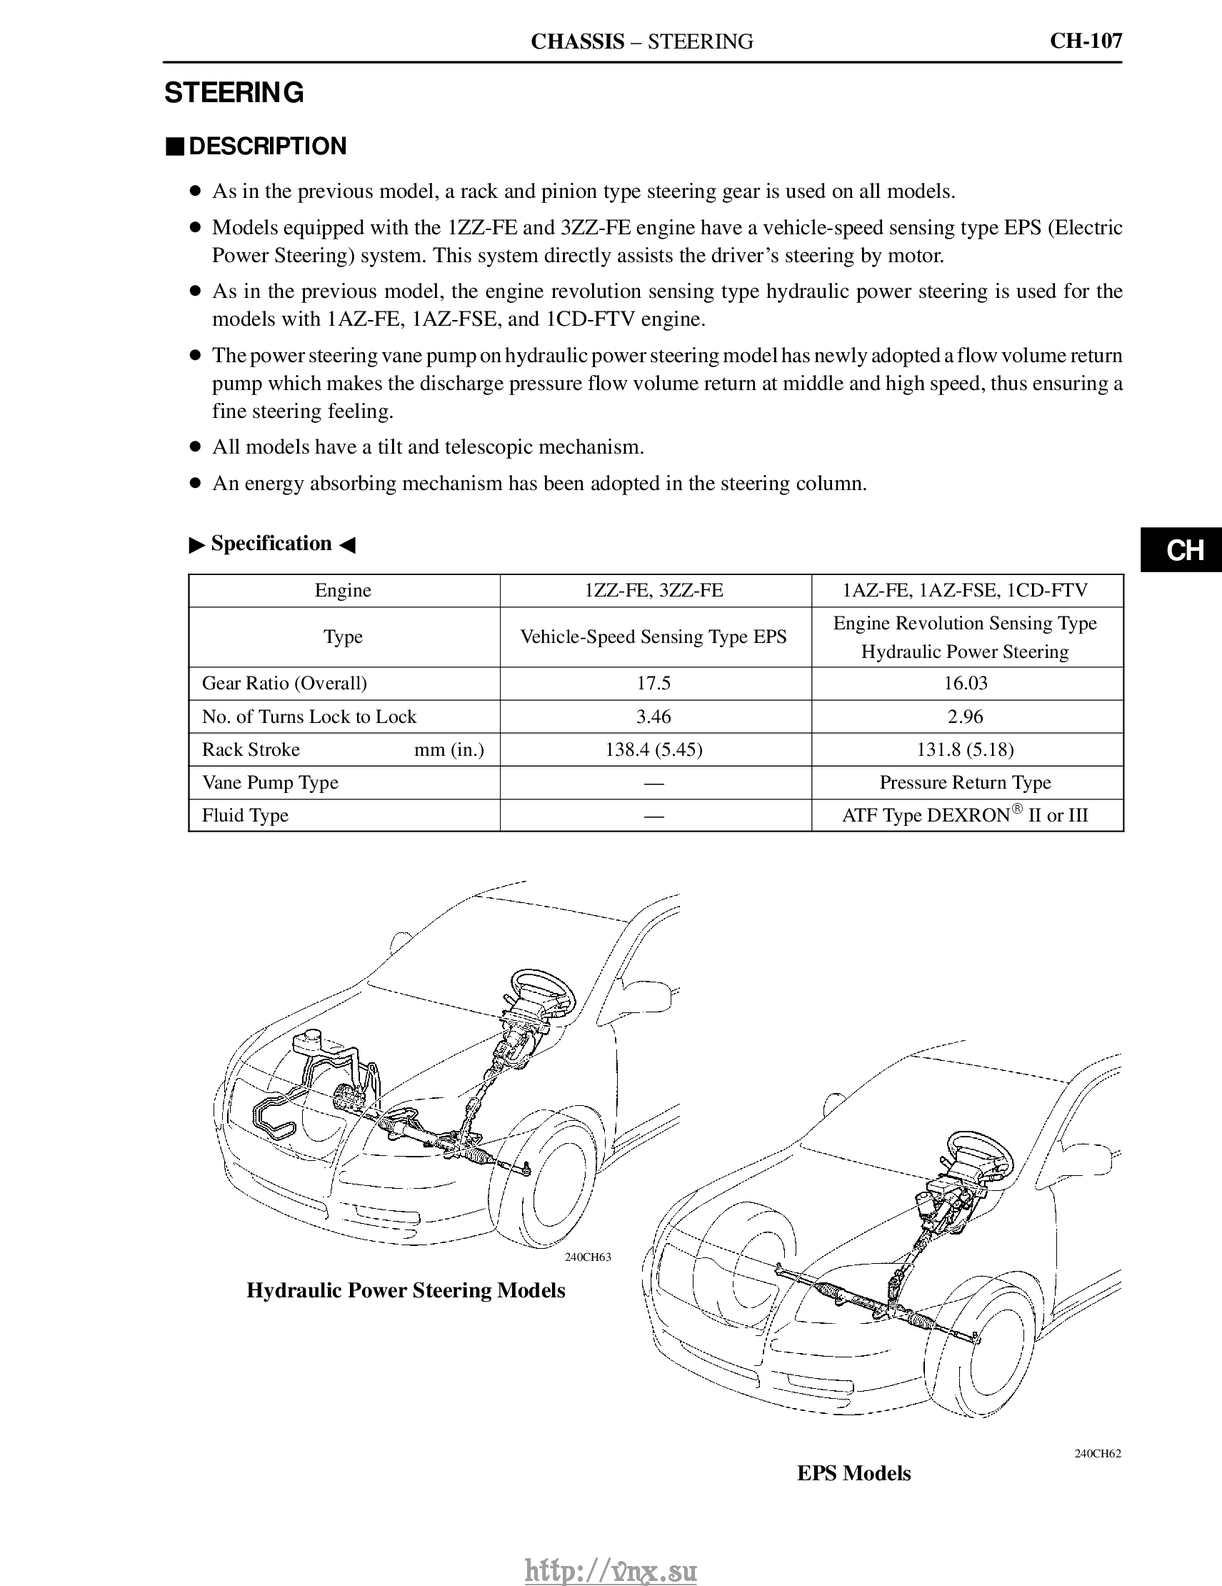 p1 calam�o vnx su avensis mts 2005 pdf_�����2 1az fe engine wiring diagram at sewacar.co